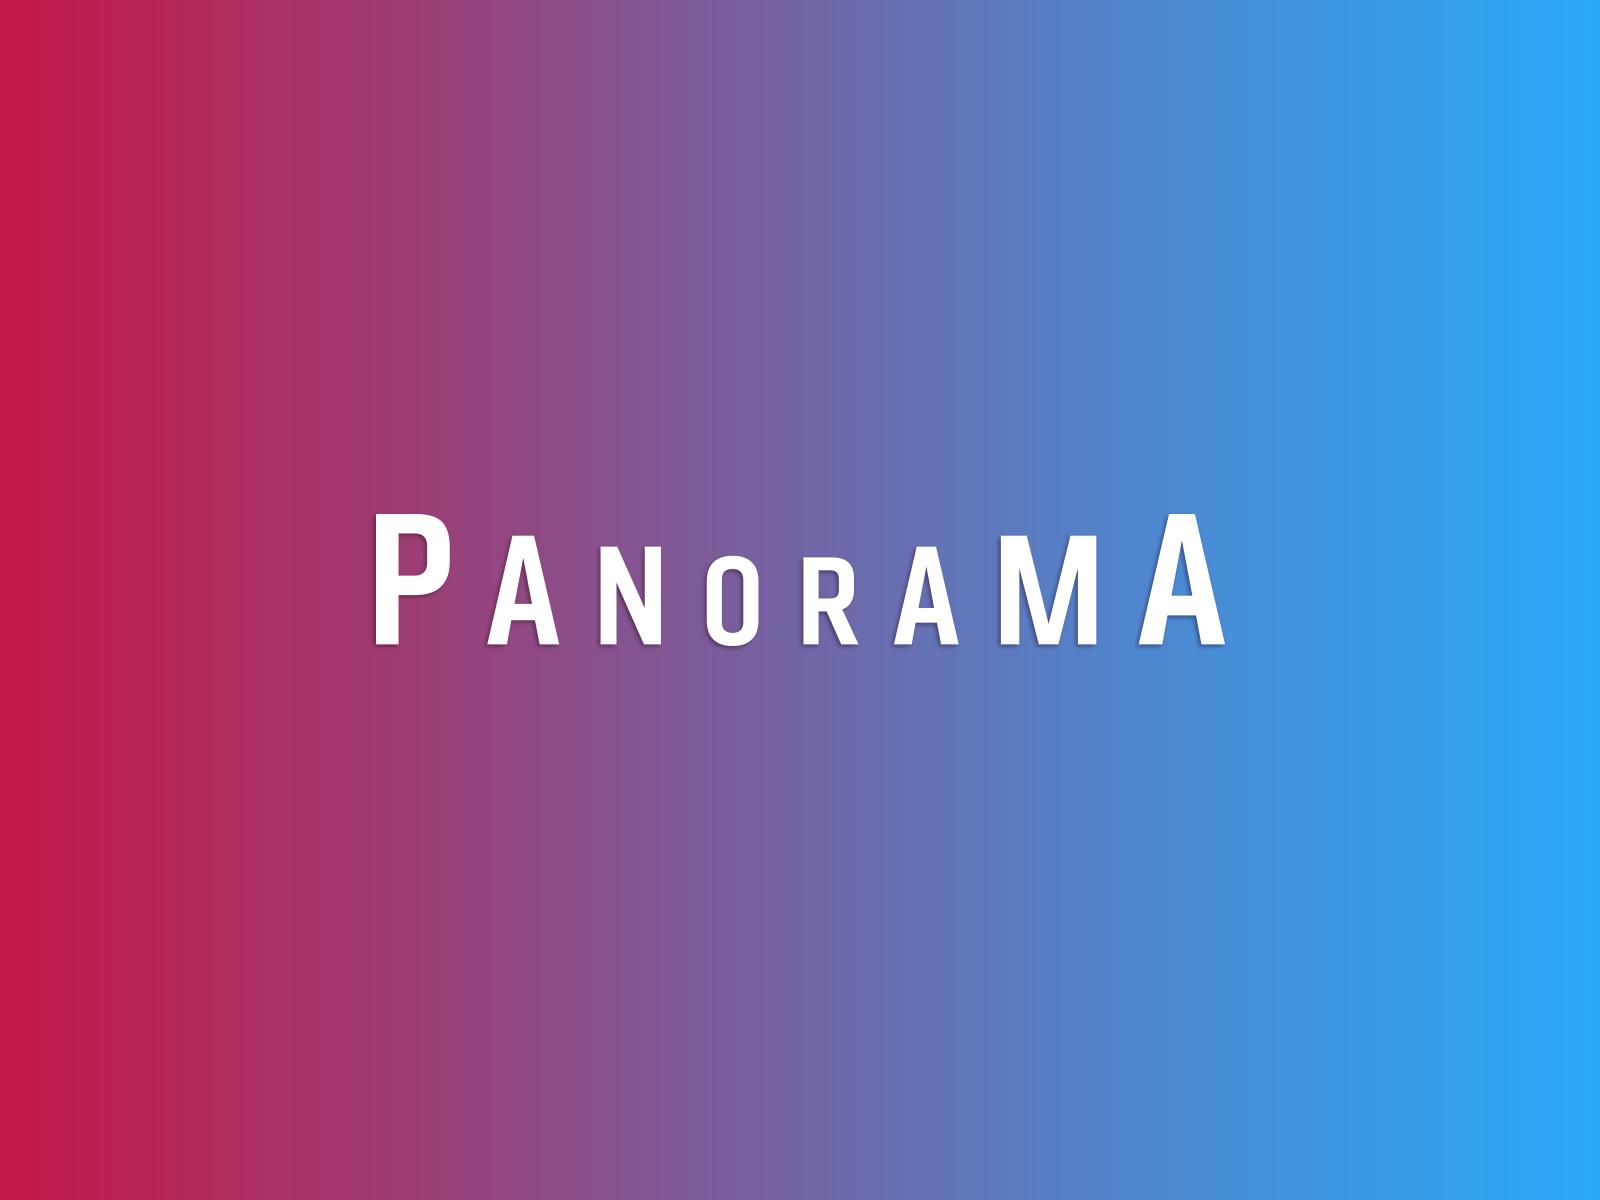 Panorama Logotype / concept